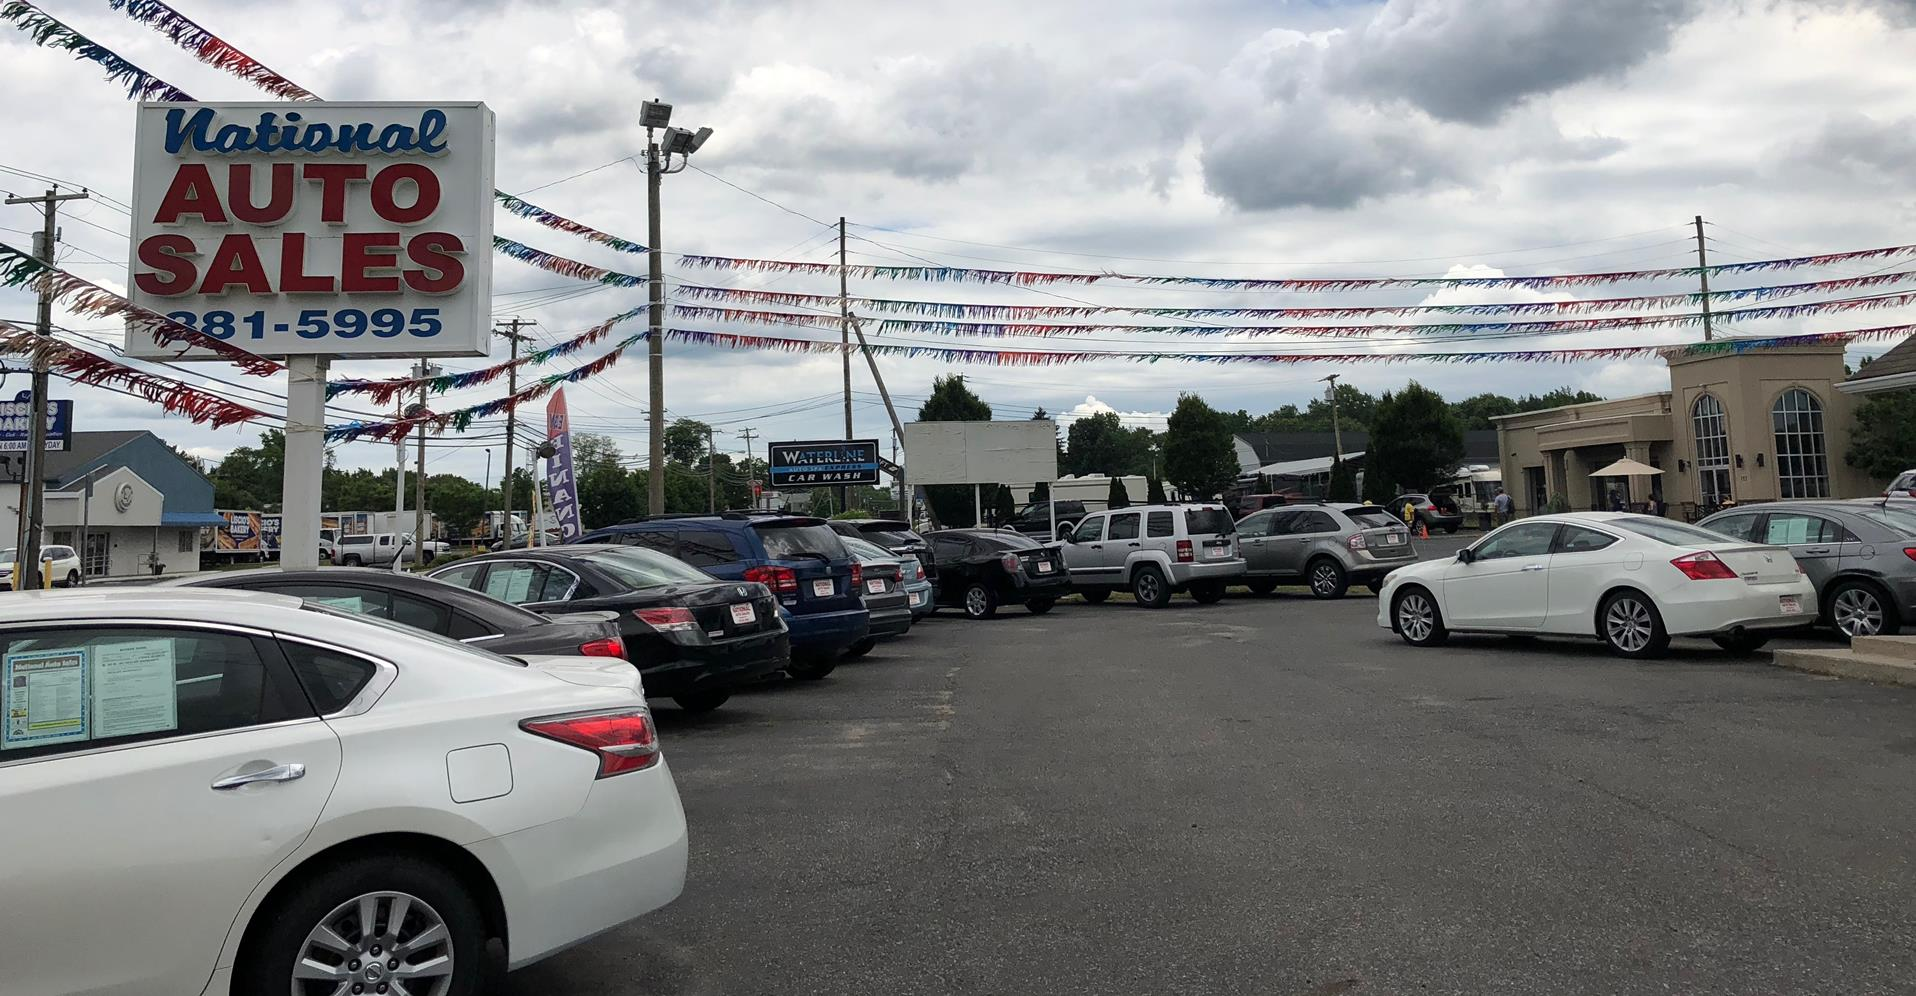 National Auto Sales Glassboro Nj New Used Cars Trucks Sales